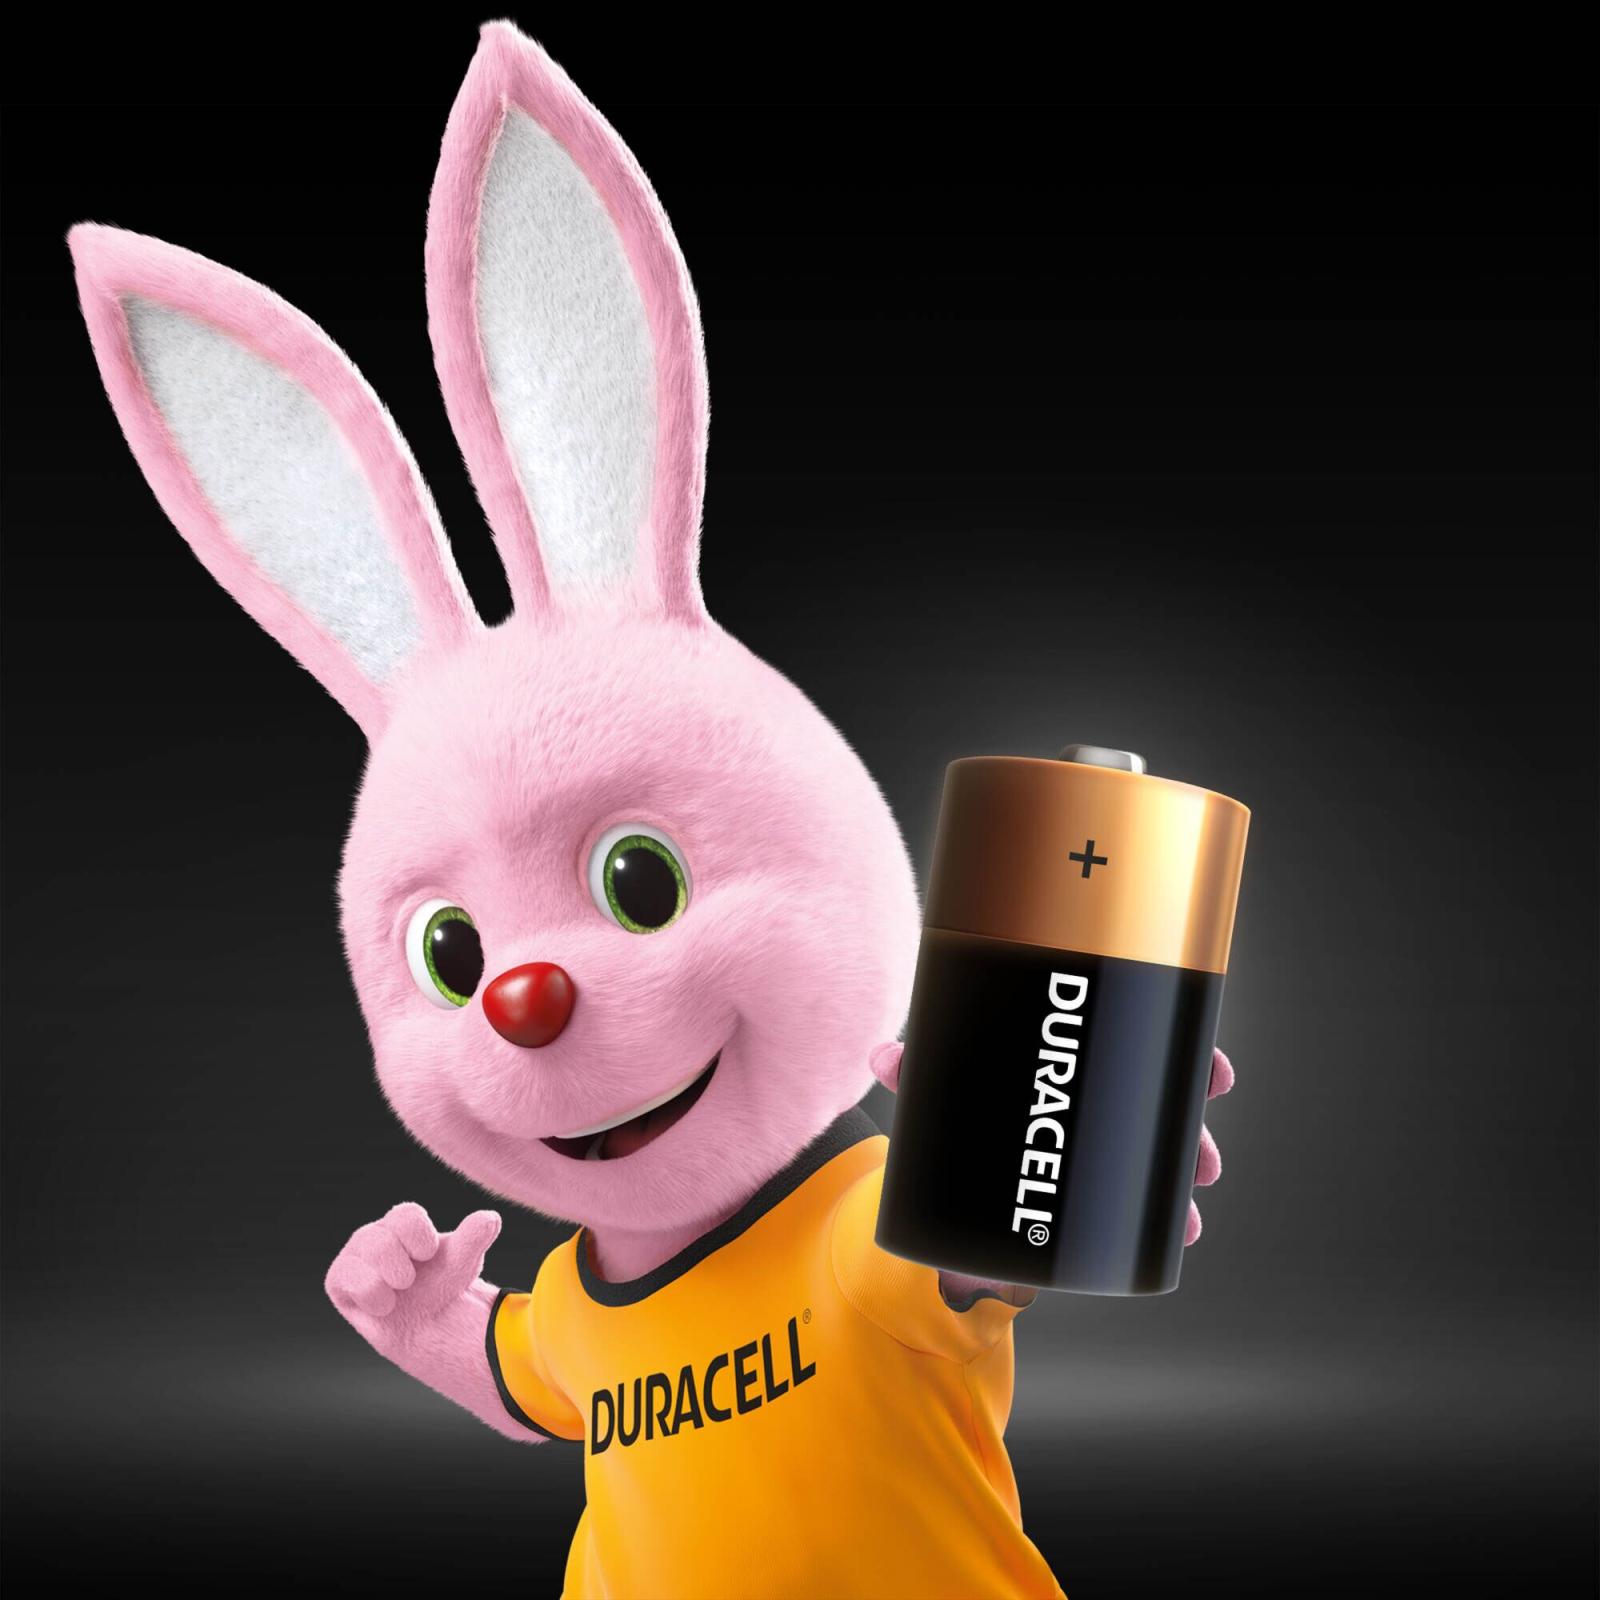 Батарейка Duracell D LR20 * 2 (5000394052512 / 81483648) изображение 3